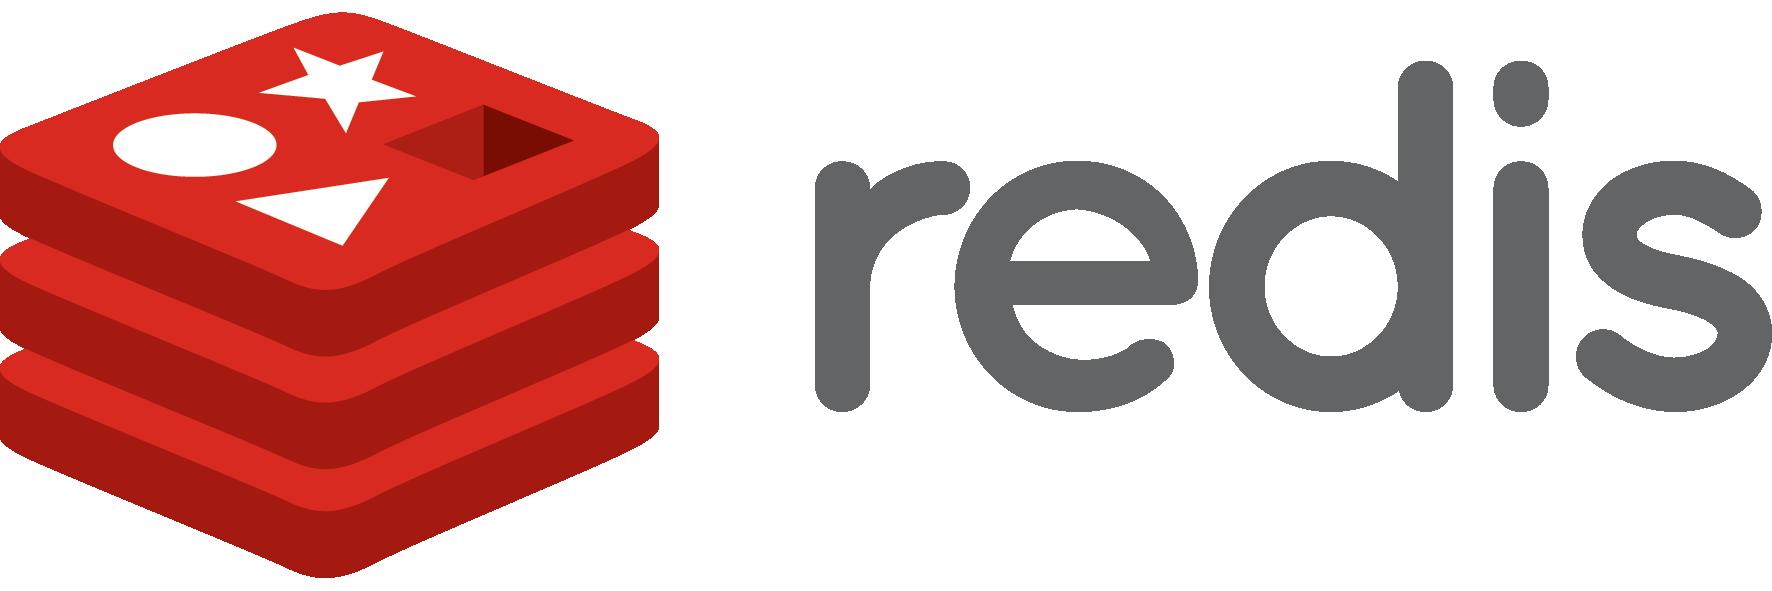 The Austin Redis Meetup Group image